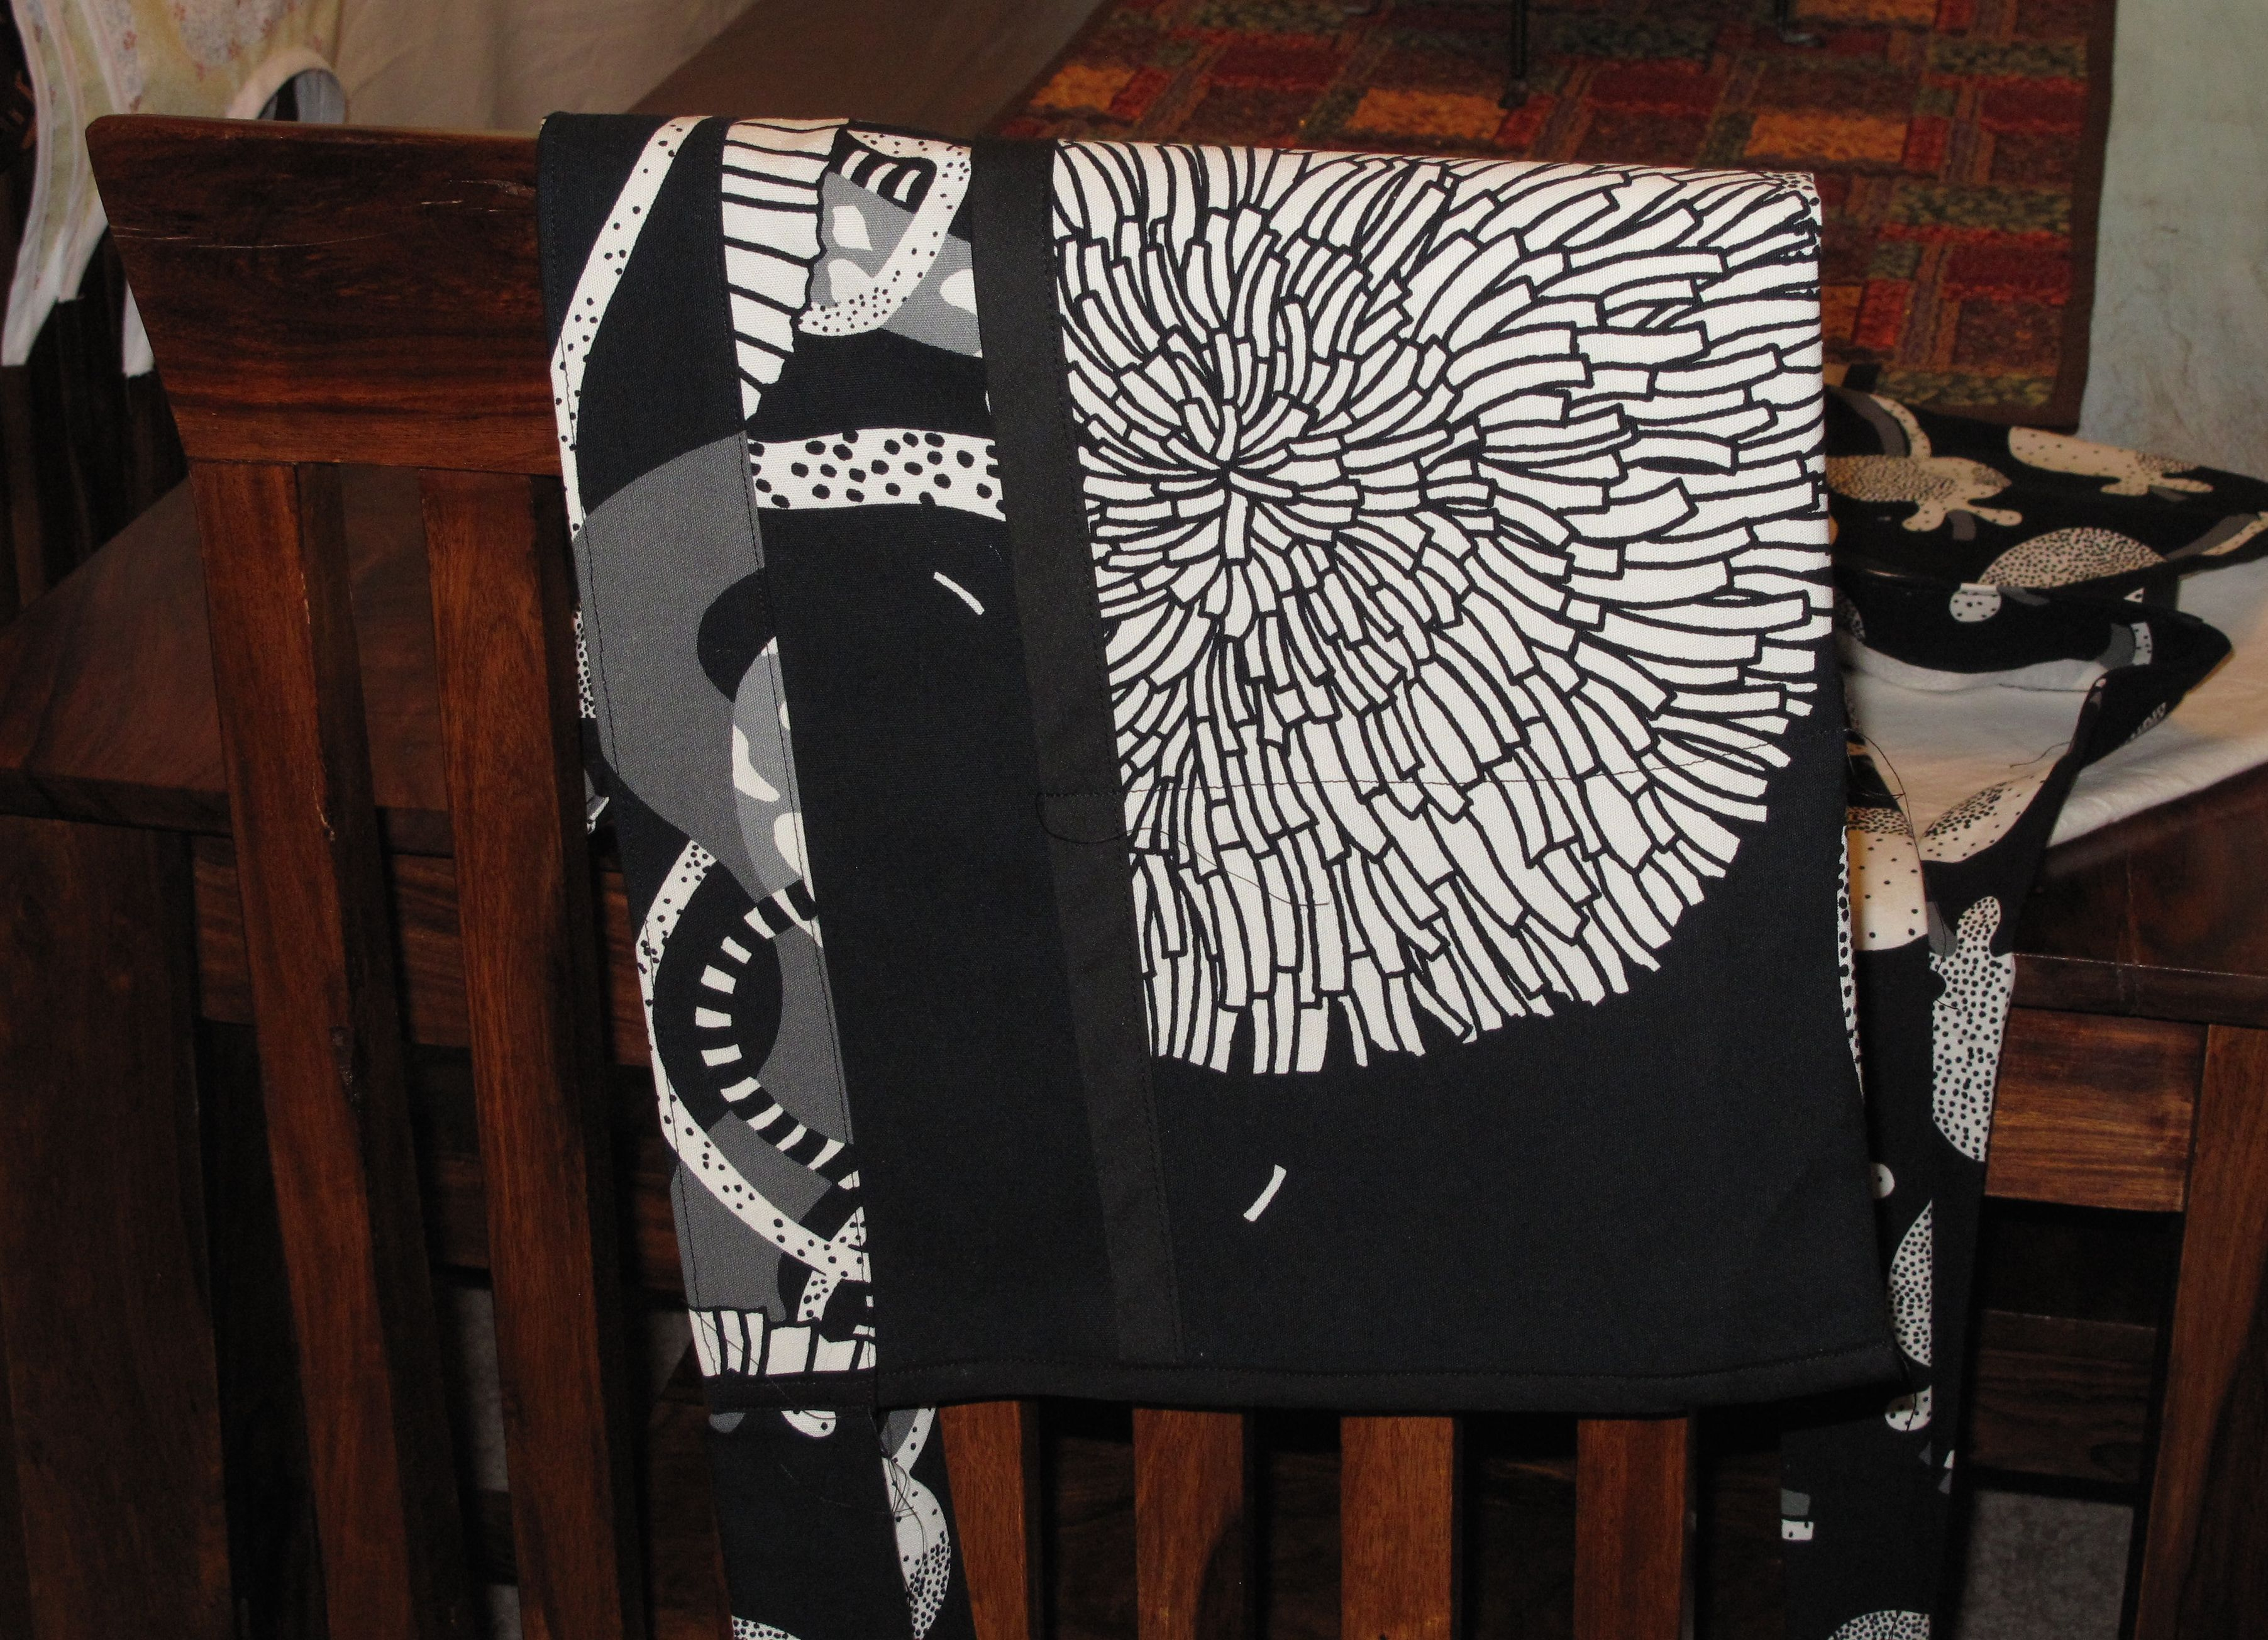 White apron joann fabrics - Black And White Cafe Apron